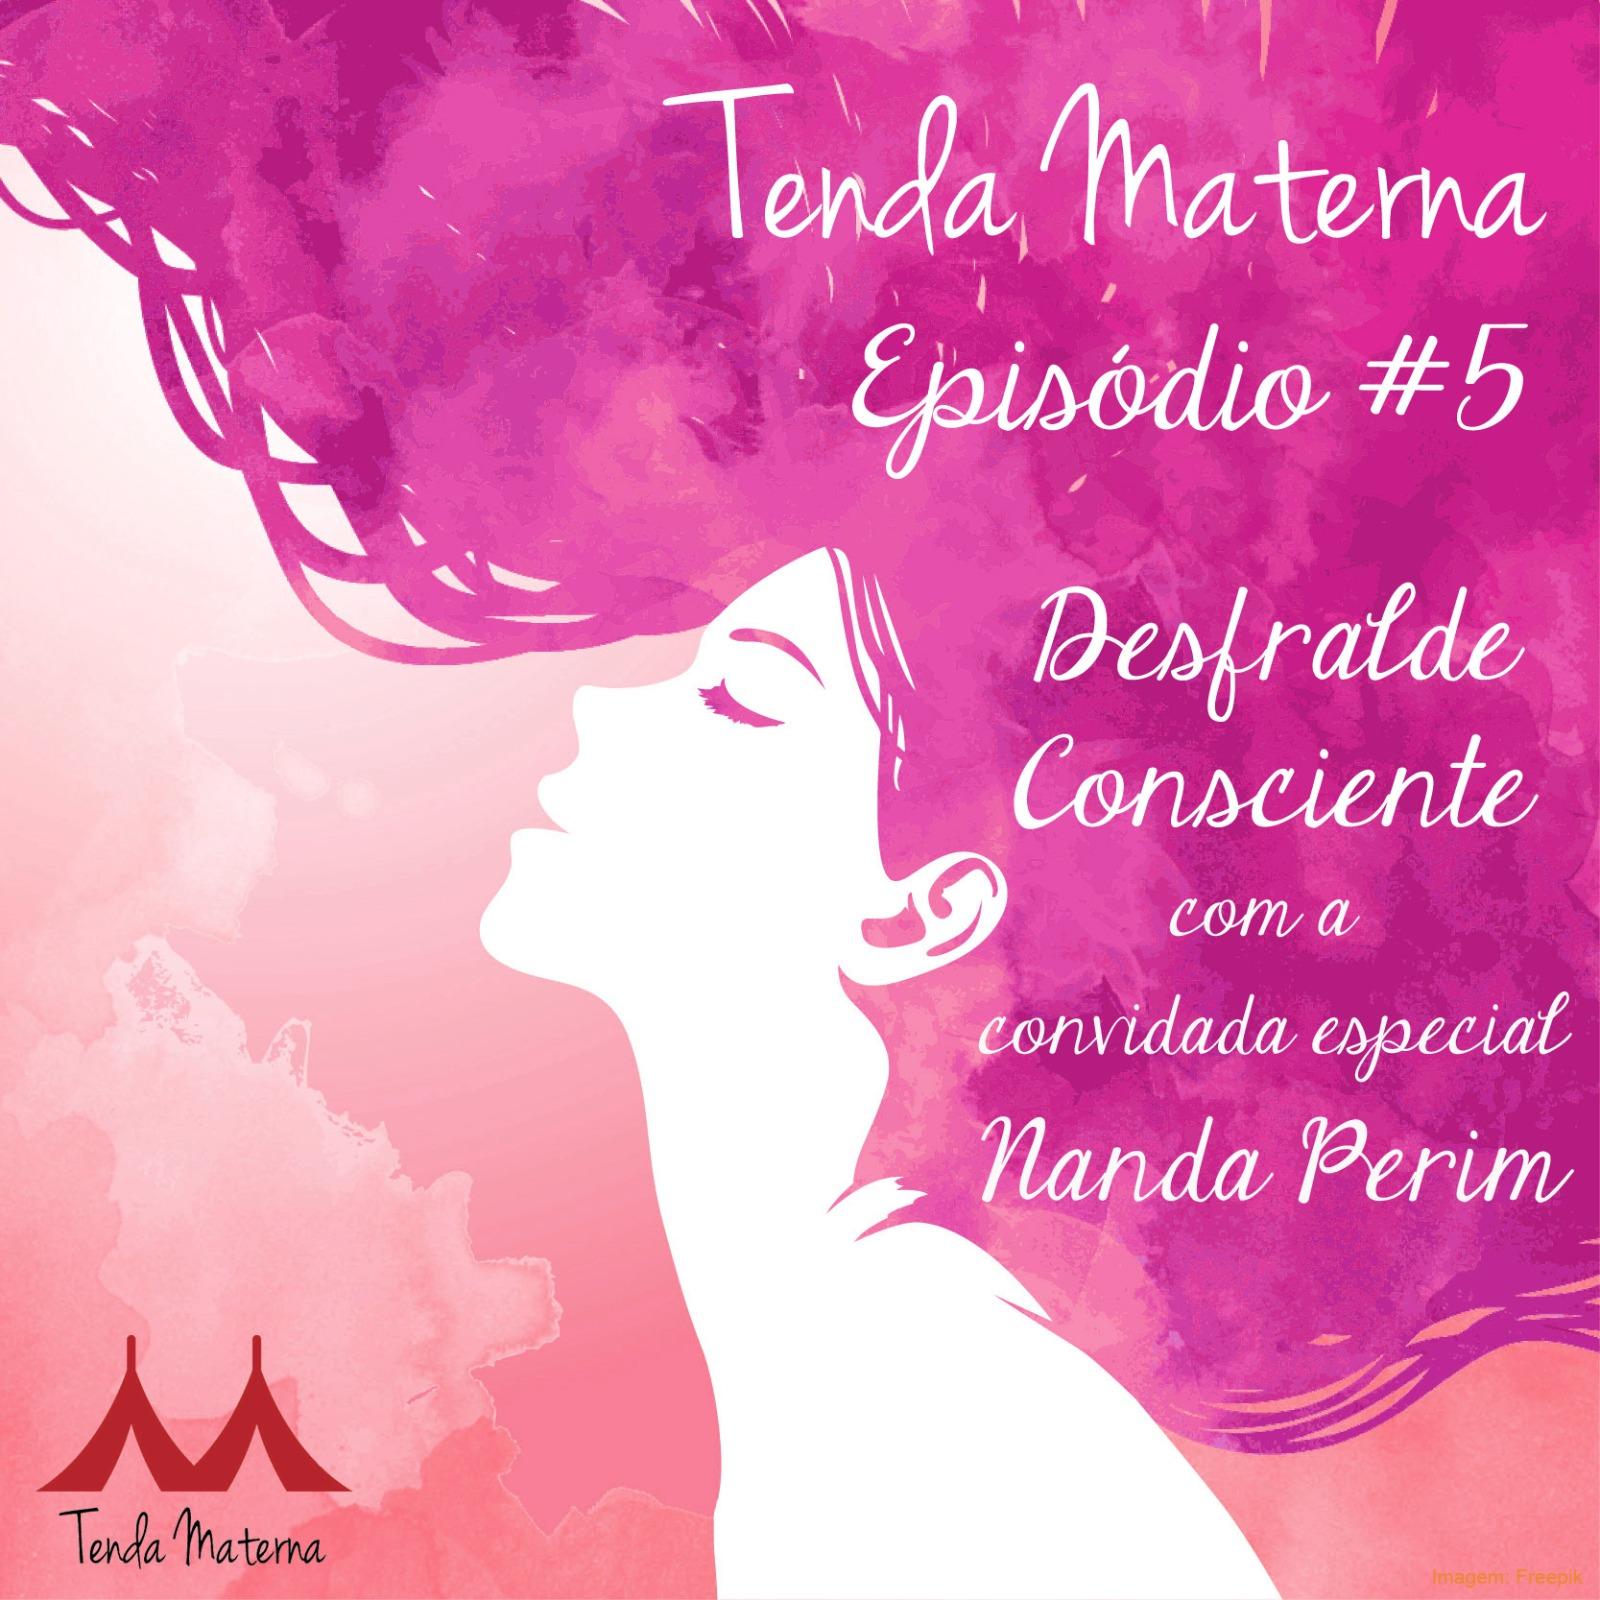 PodCast Tenda Materna #5: Desfralde Consciente